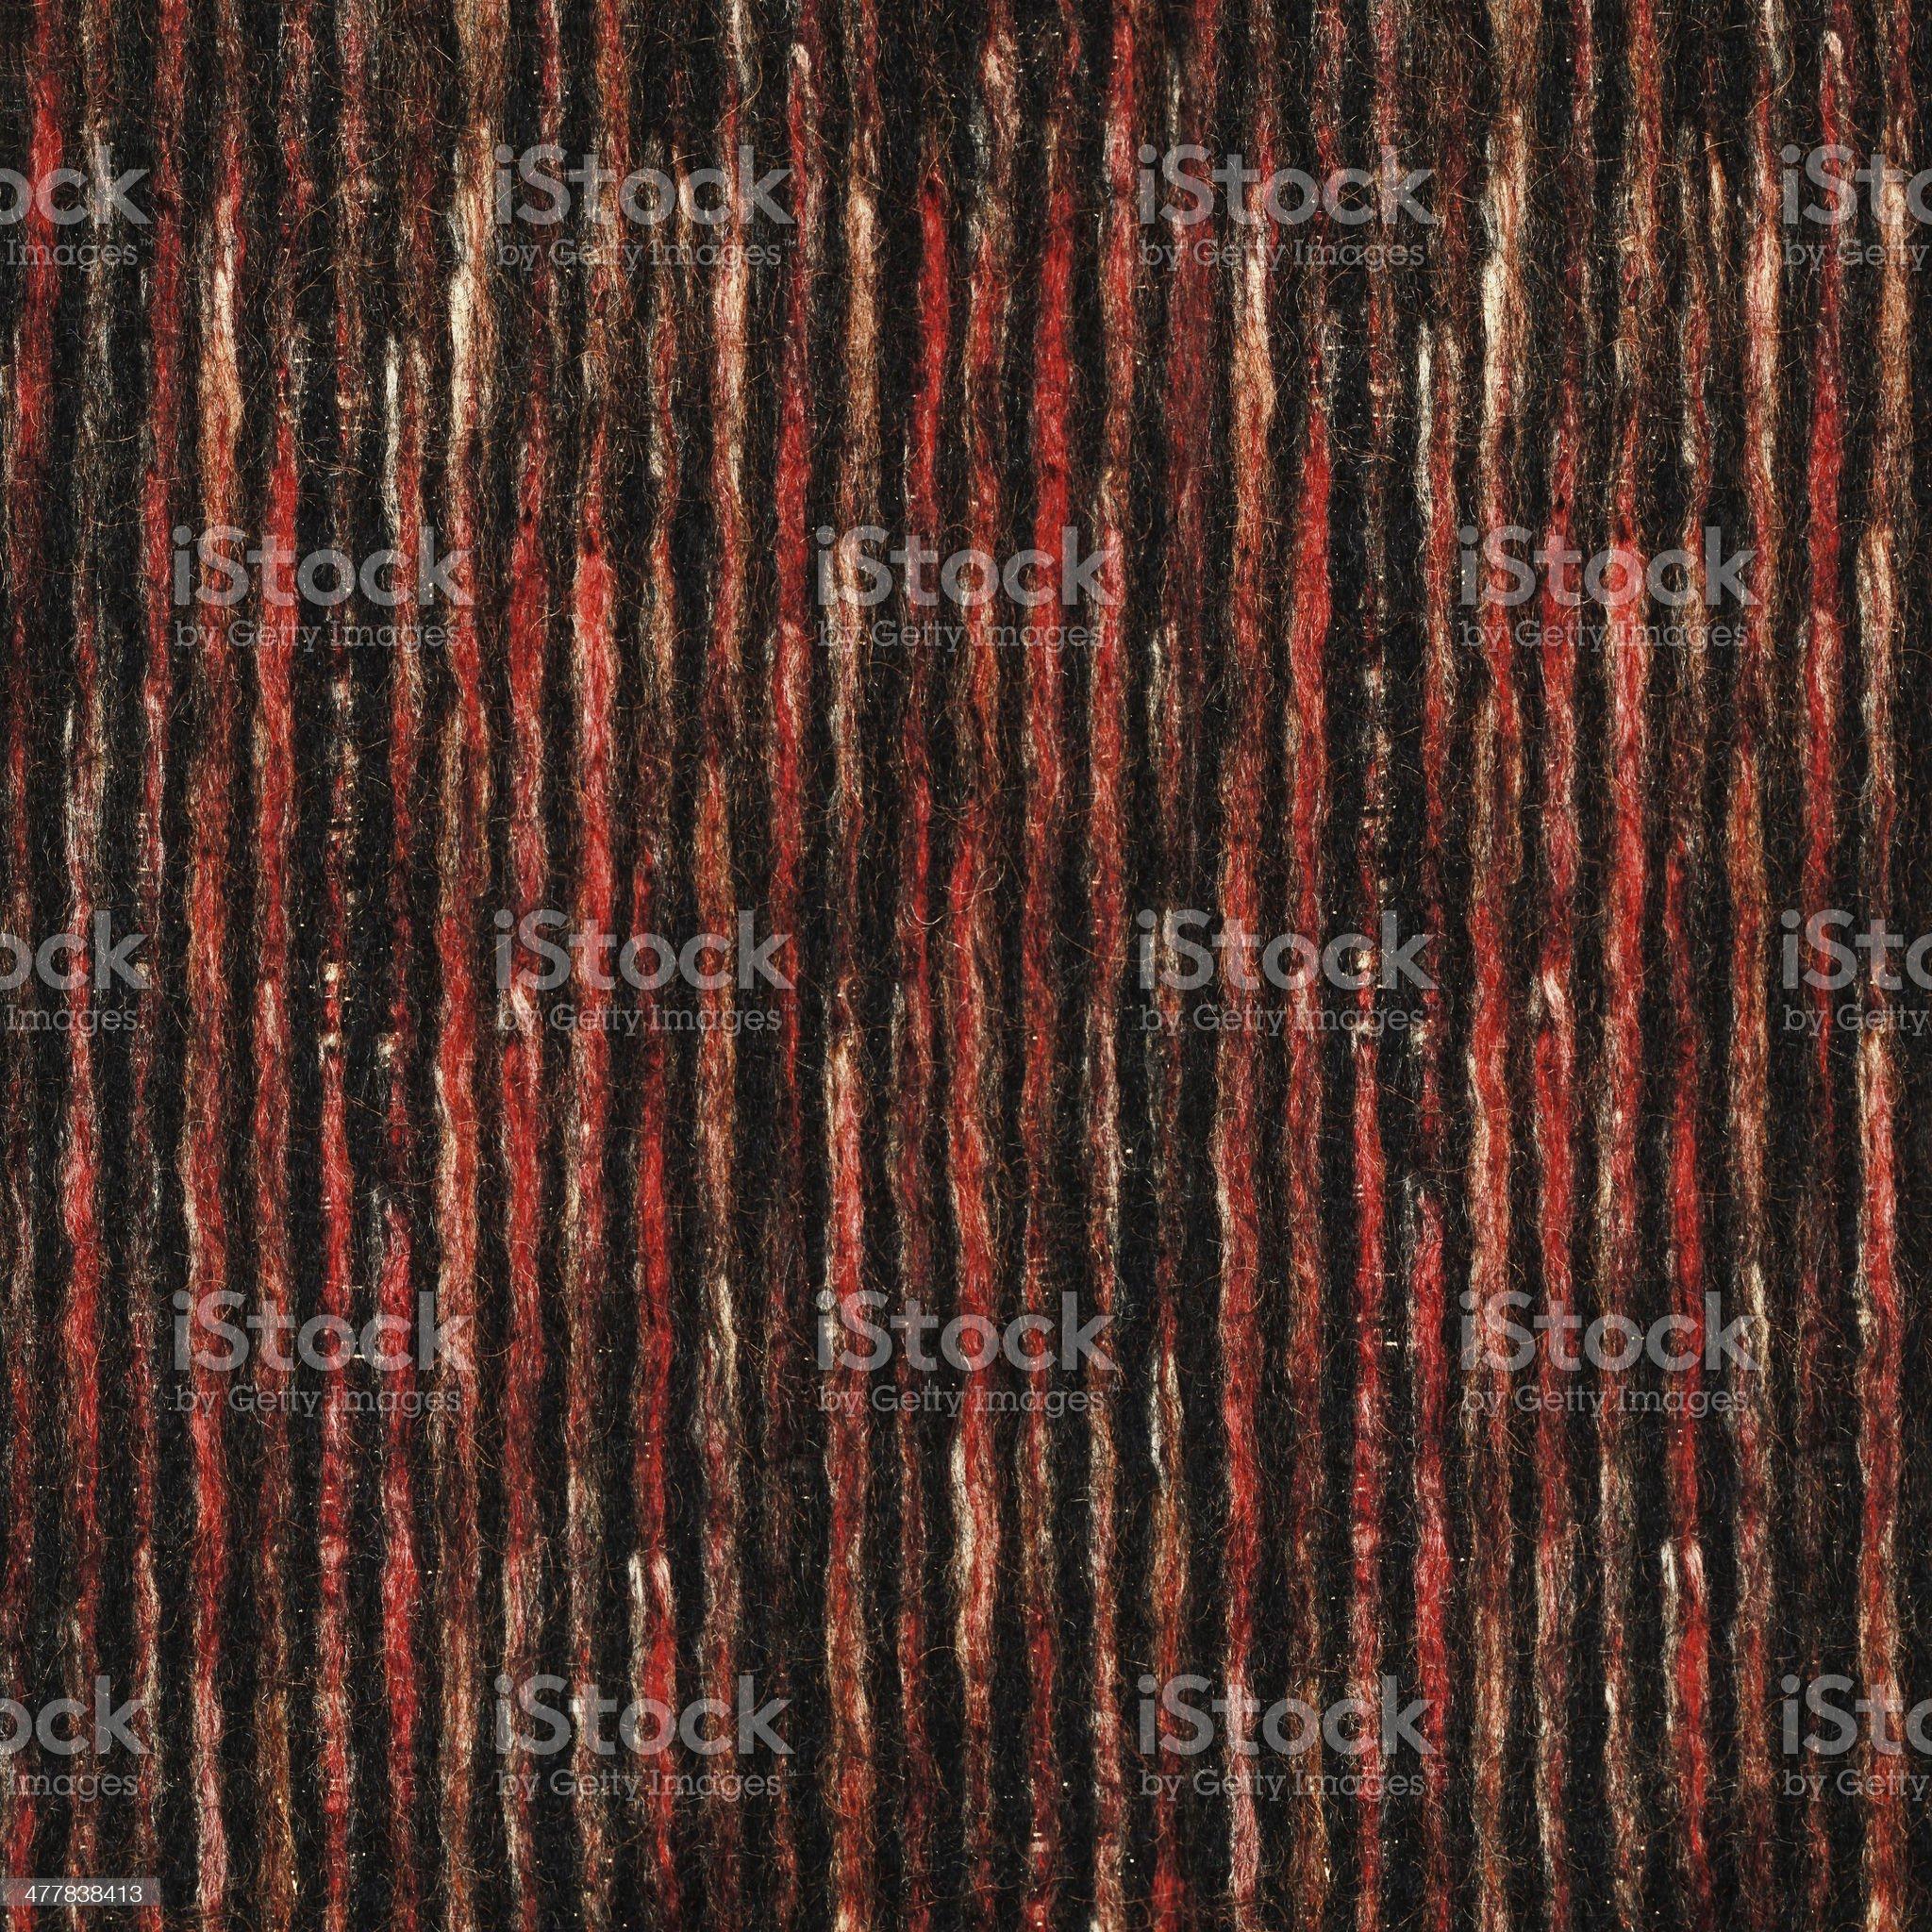 Plaid Pattern Textile royalty-free stock photo